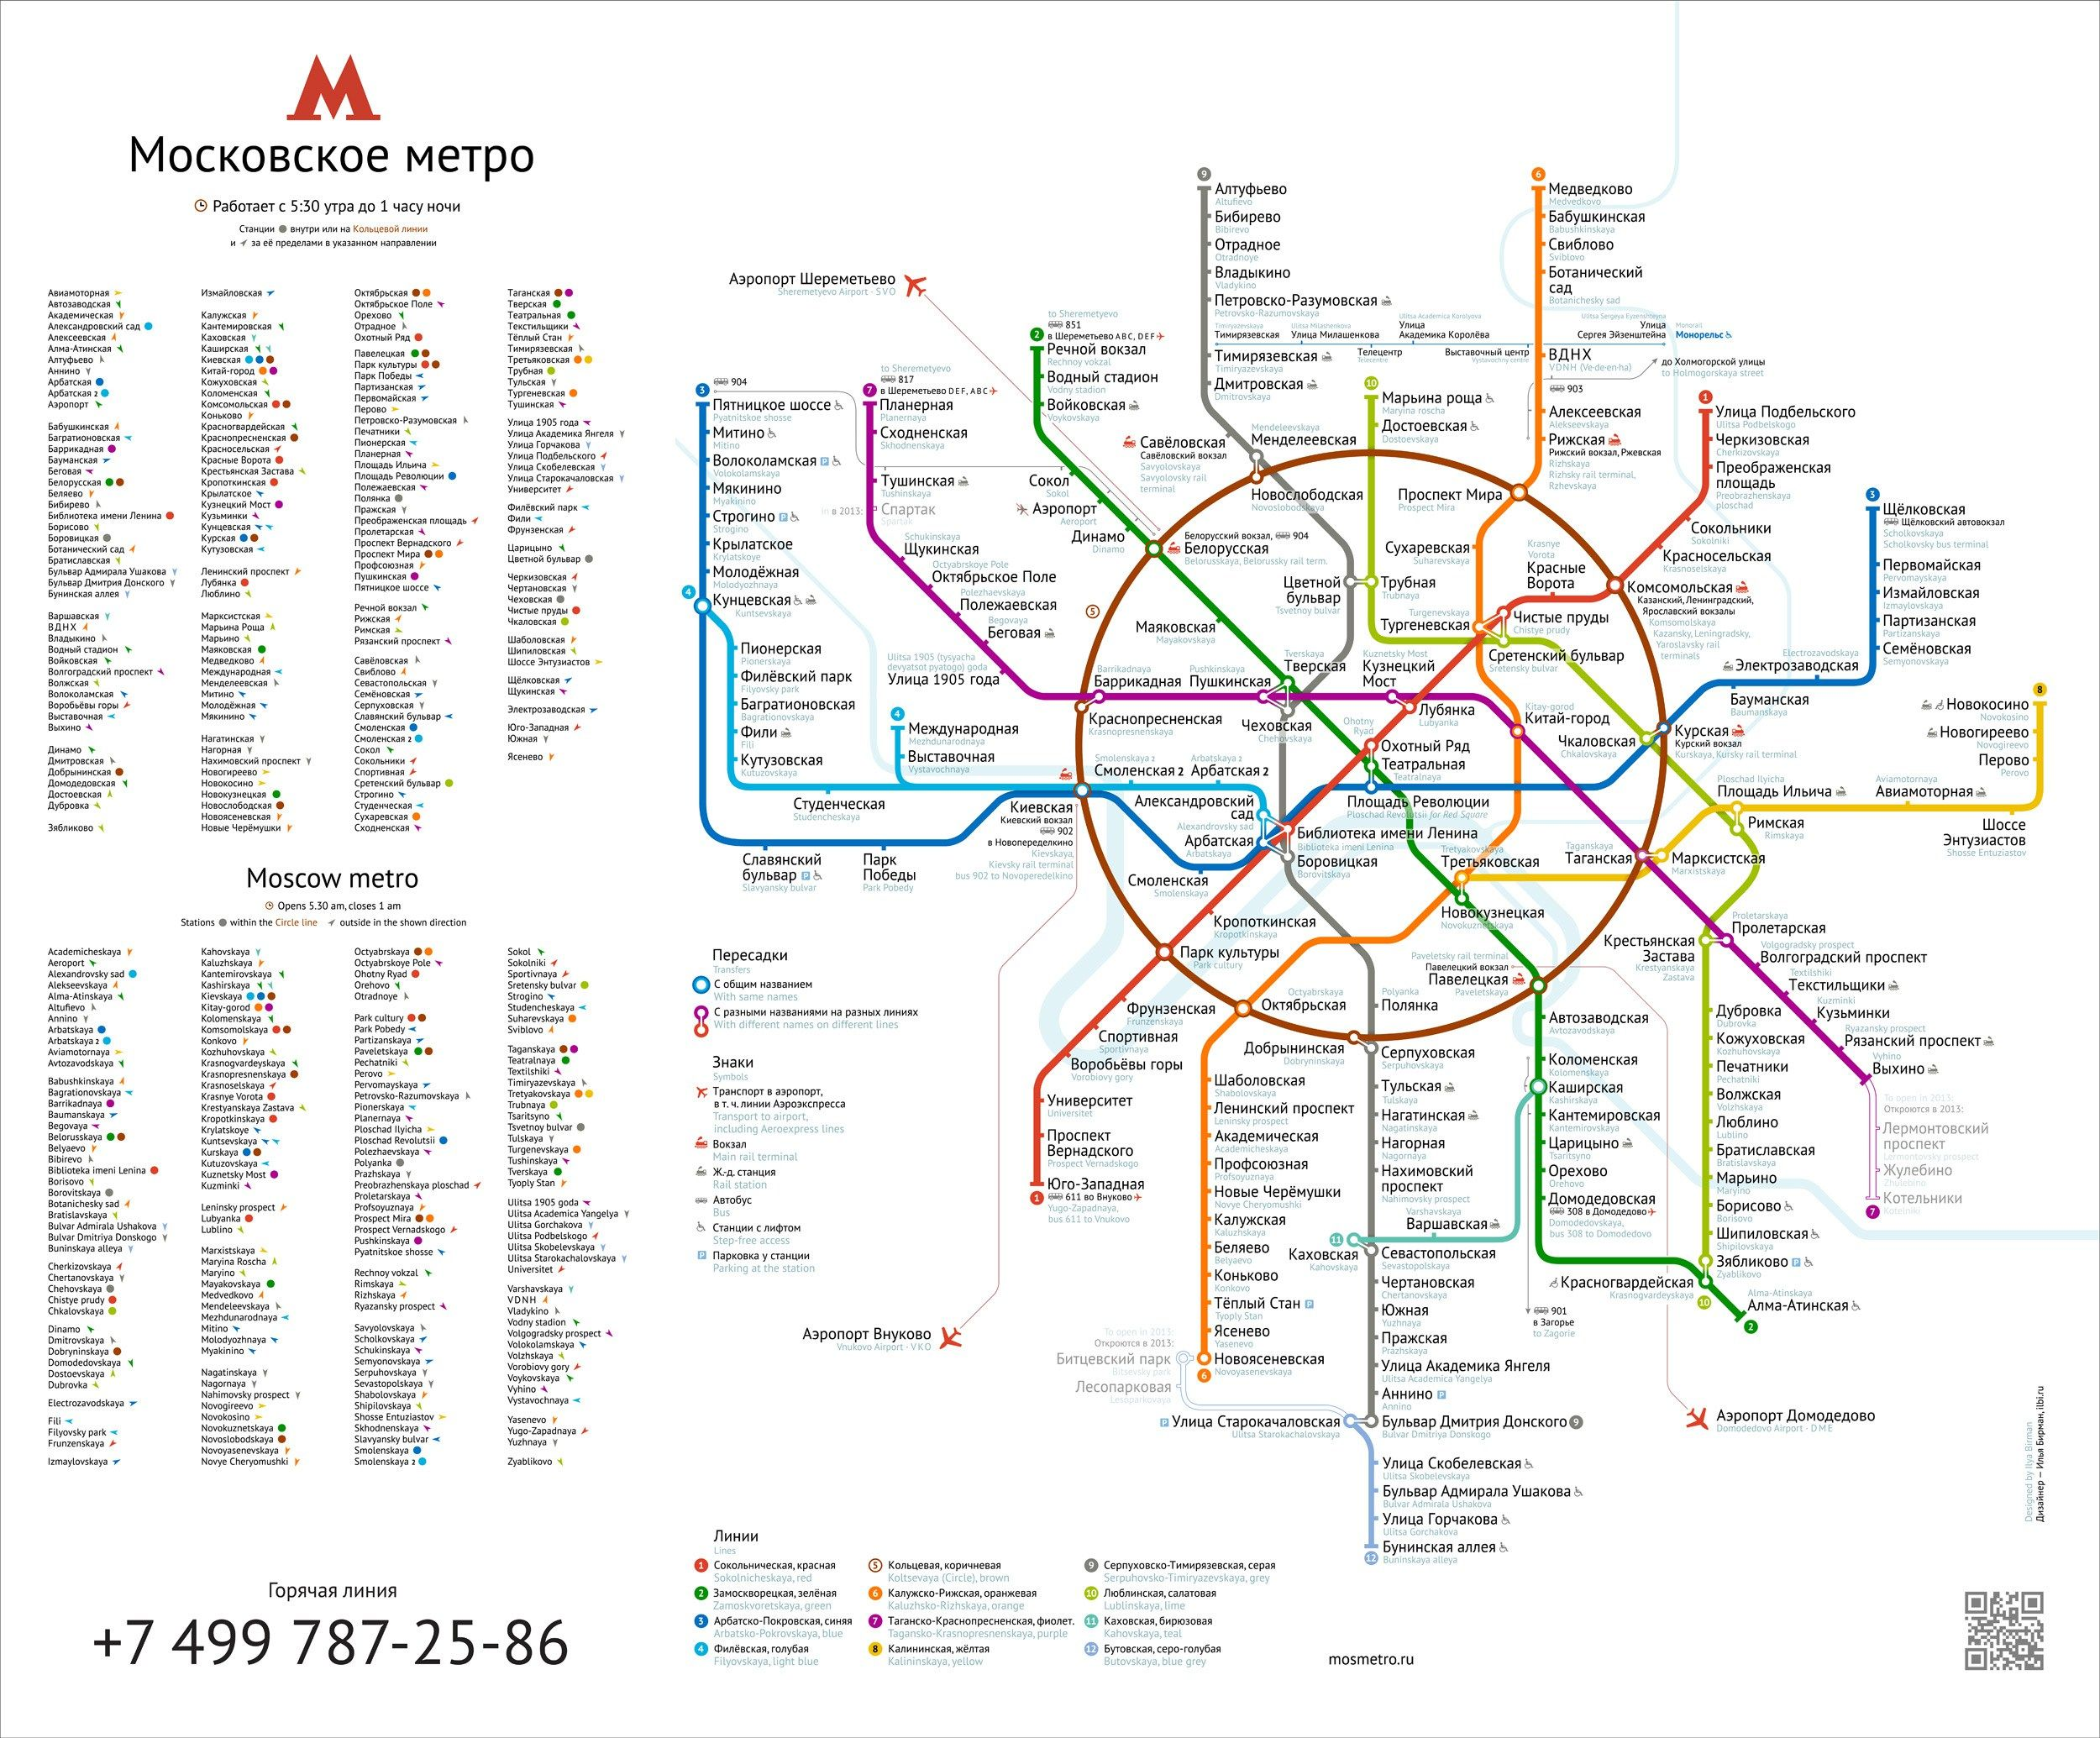 Moscow-Metro-Map-2013-Ilya-Birman.jpg 2,500×2,069 pixels